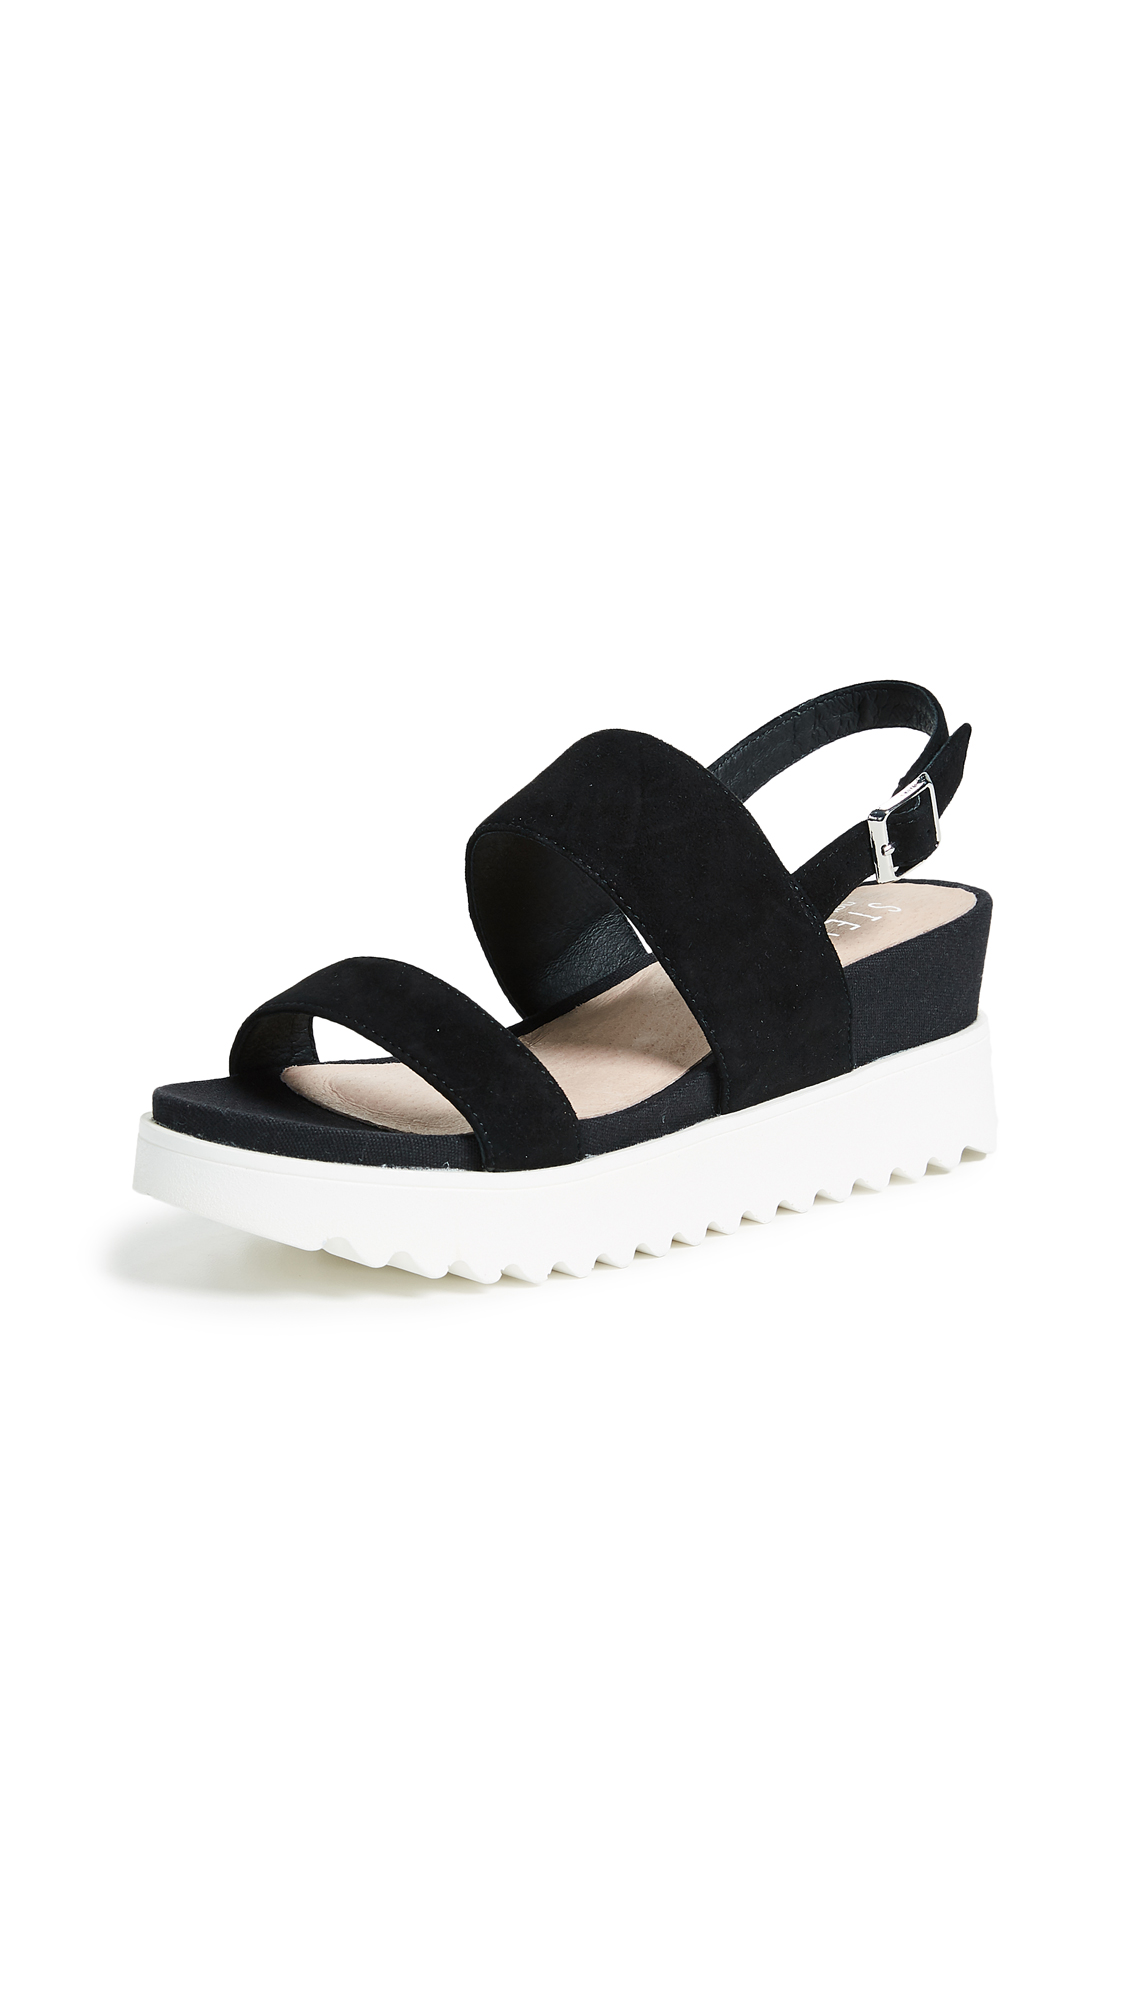 Steven Khaos Platform Sandals - Black